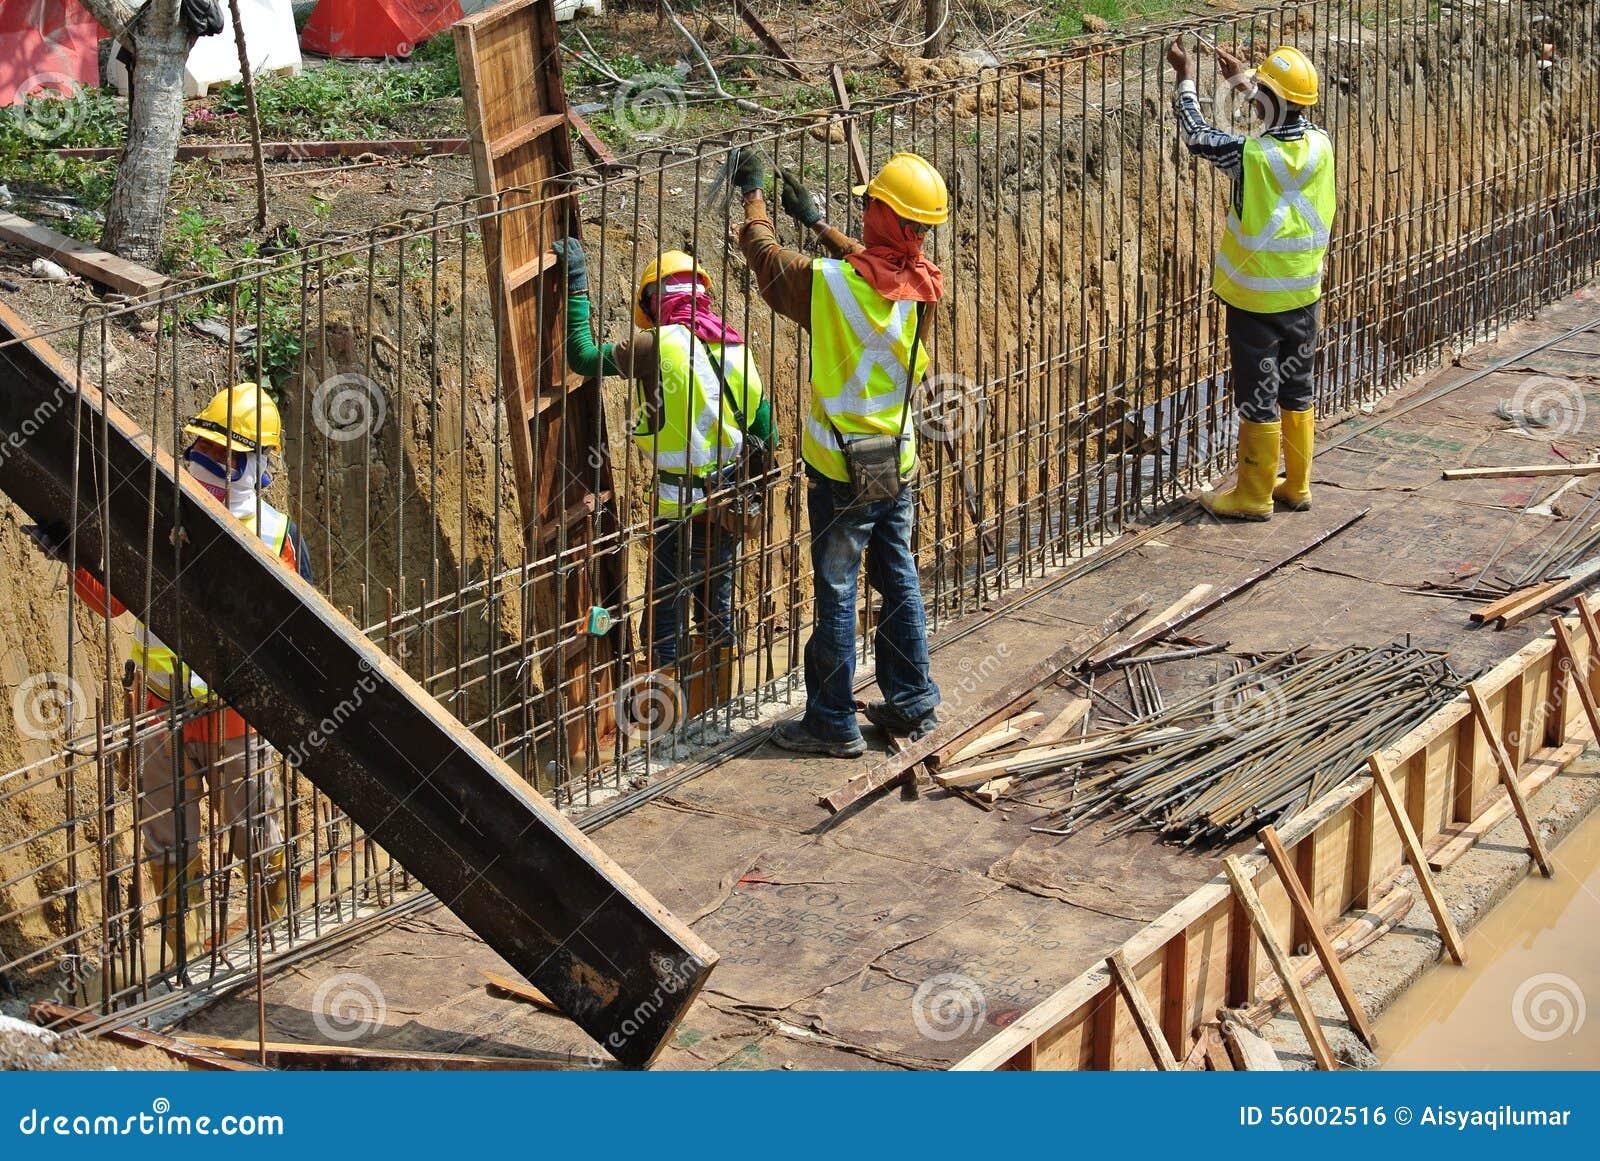 retaing wall construction